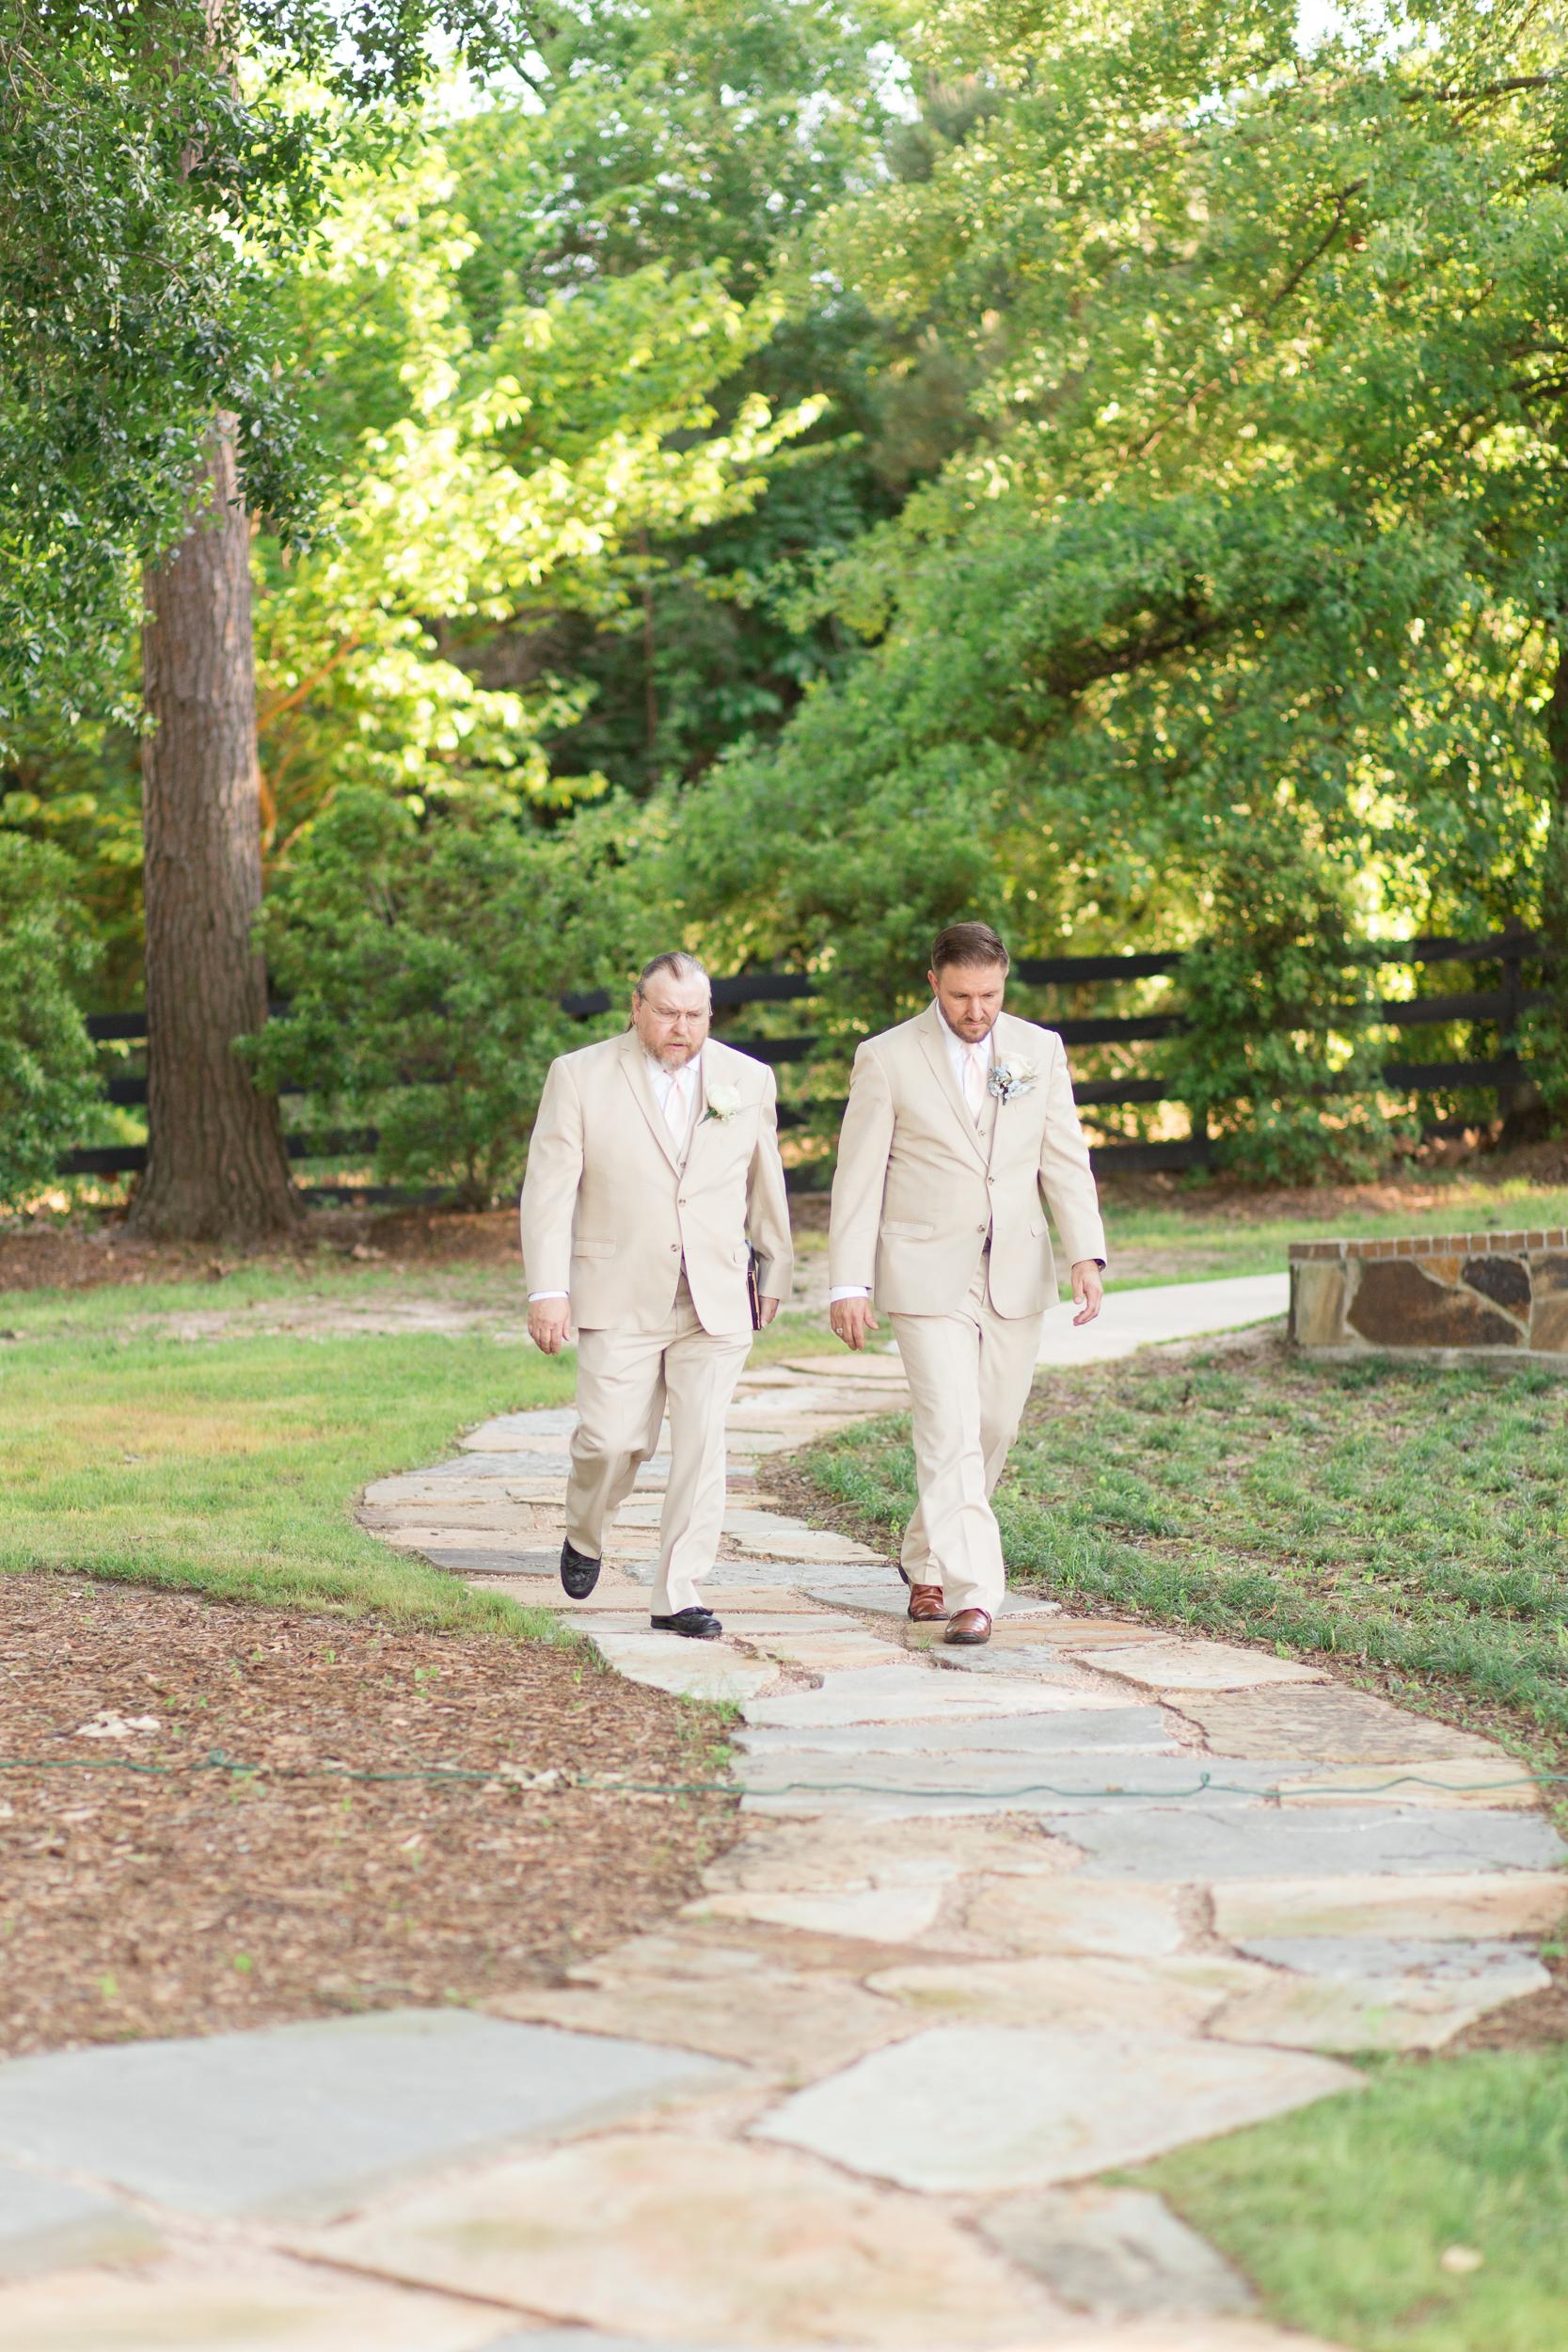 Zihlman-East TX Wedding_Kelsie Hendricks Photography_The Folmar Tyler Texas-98.jpg